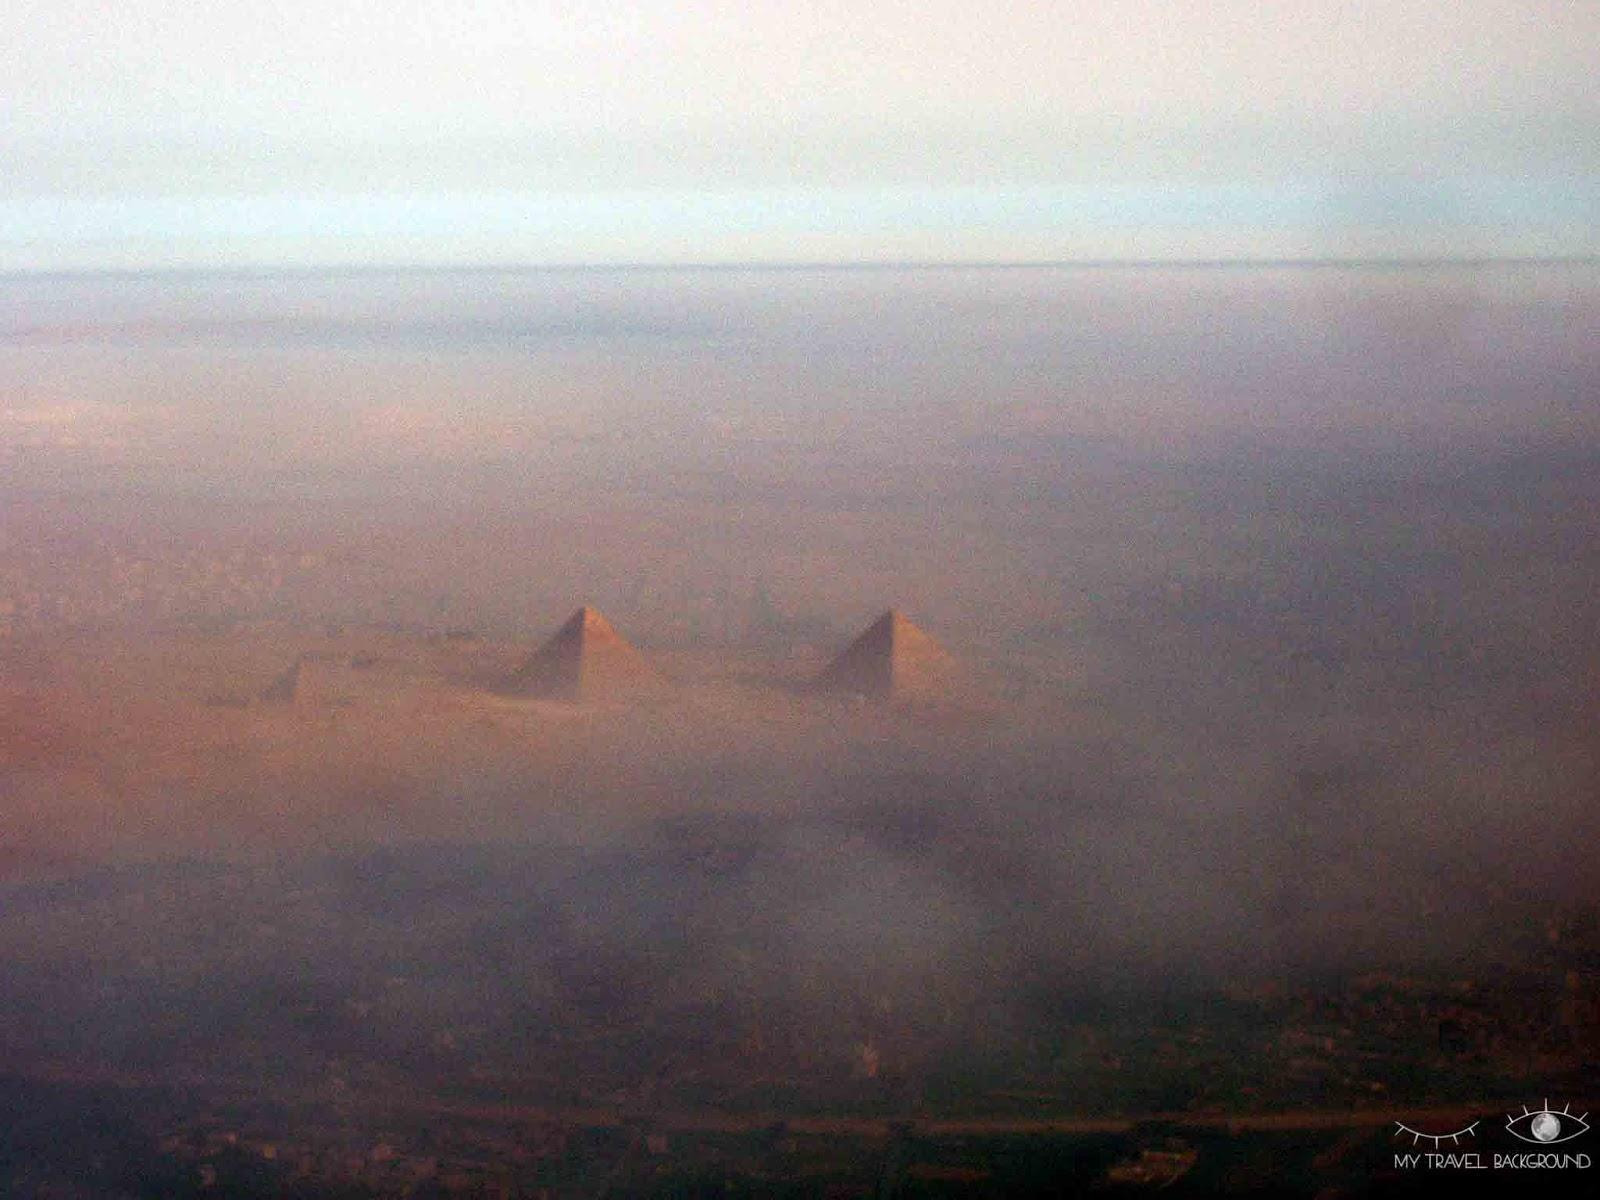 My Travel Background : 15 photos prises au bon moment ! Egypte